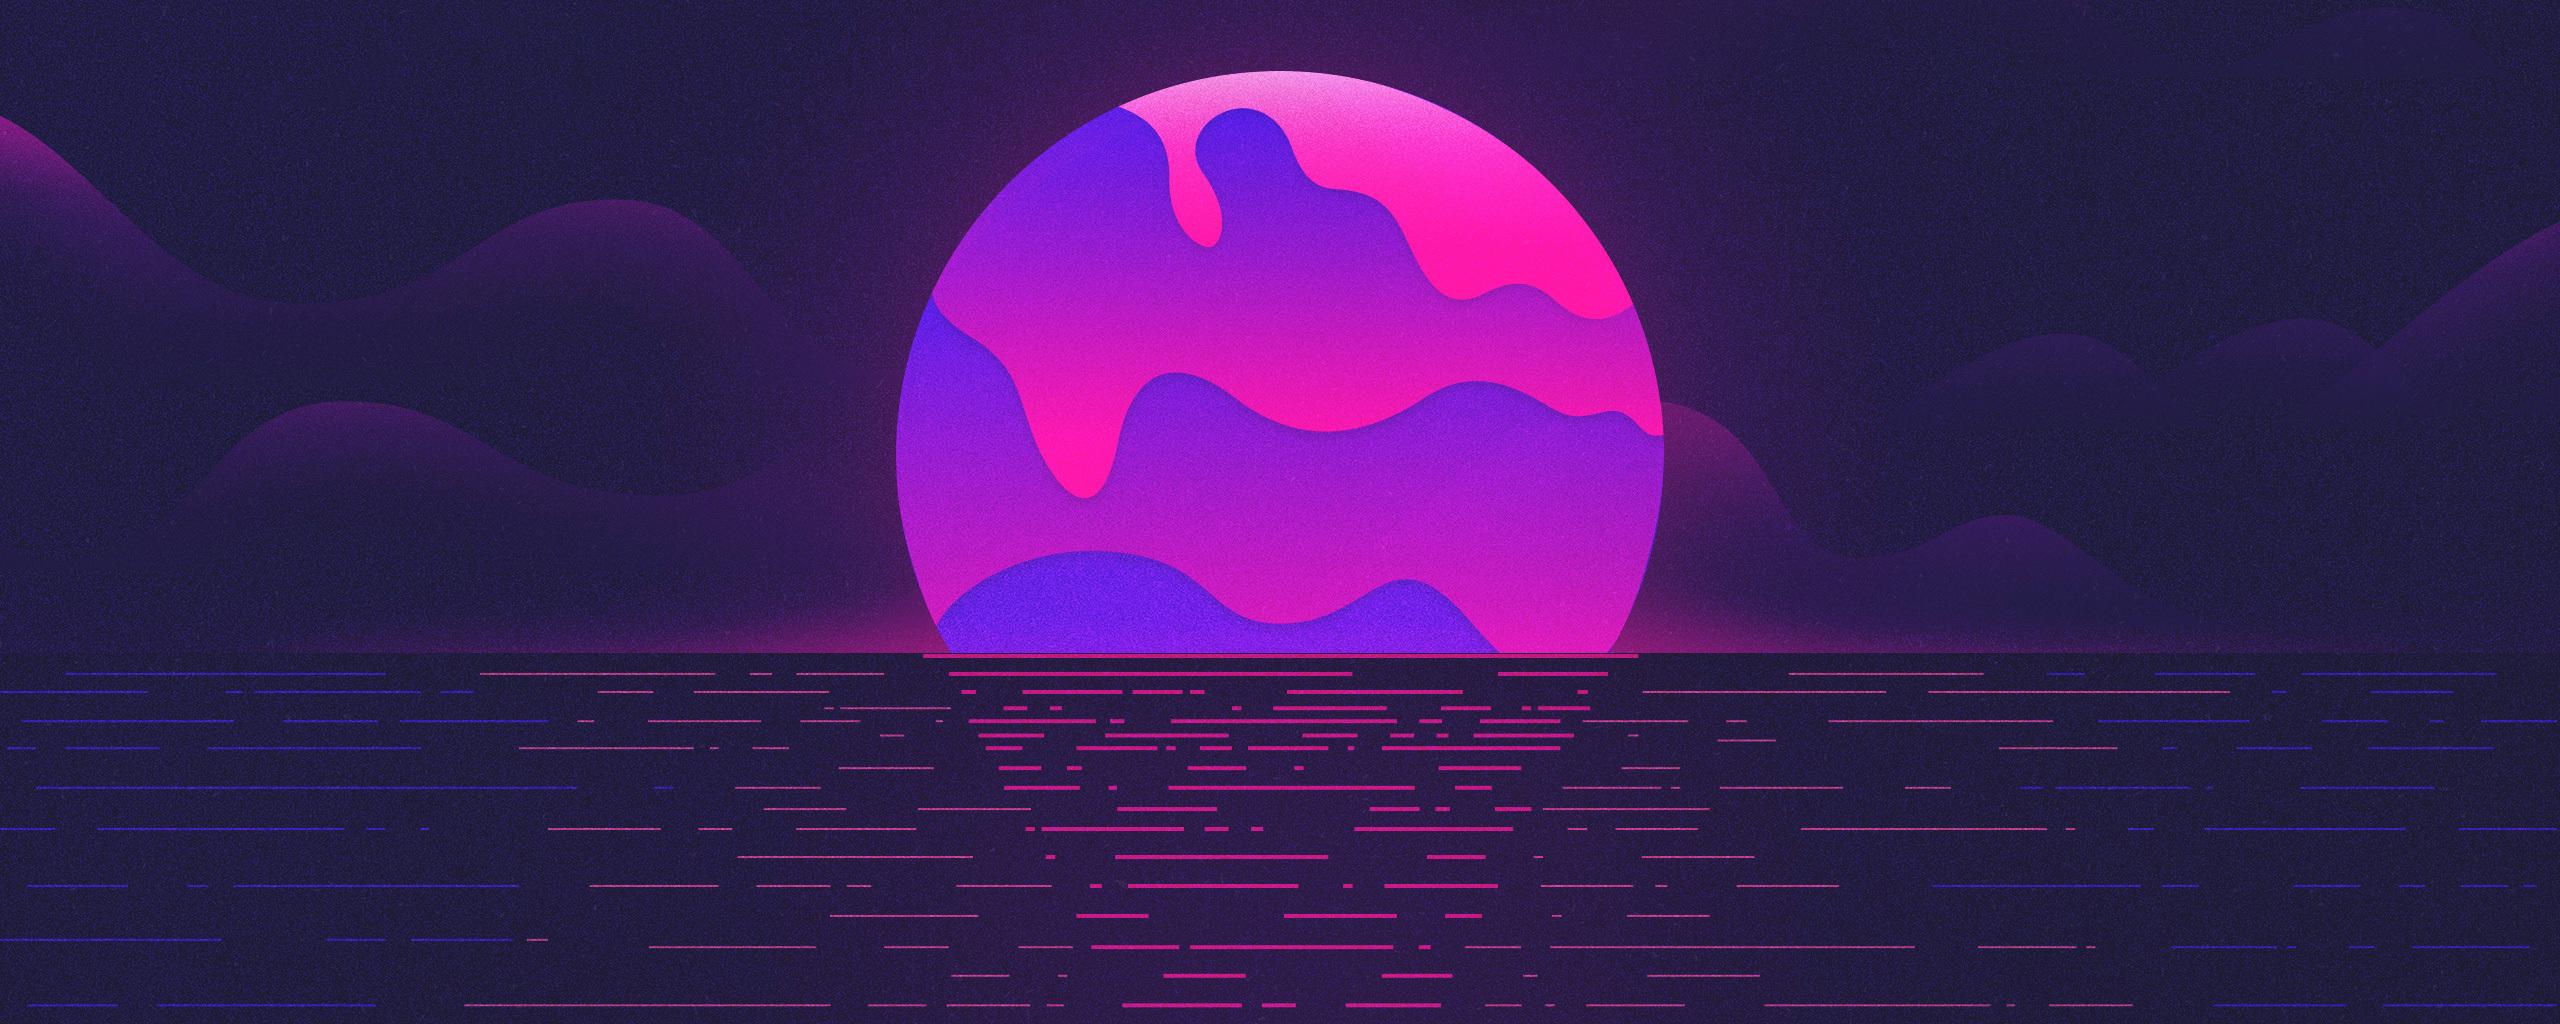 2560x1024 Melting July Sea Ocean Sunset